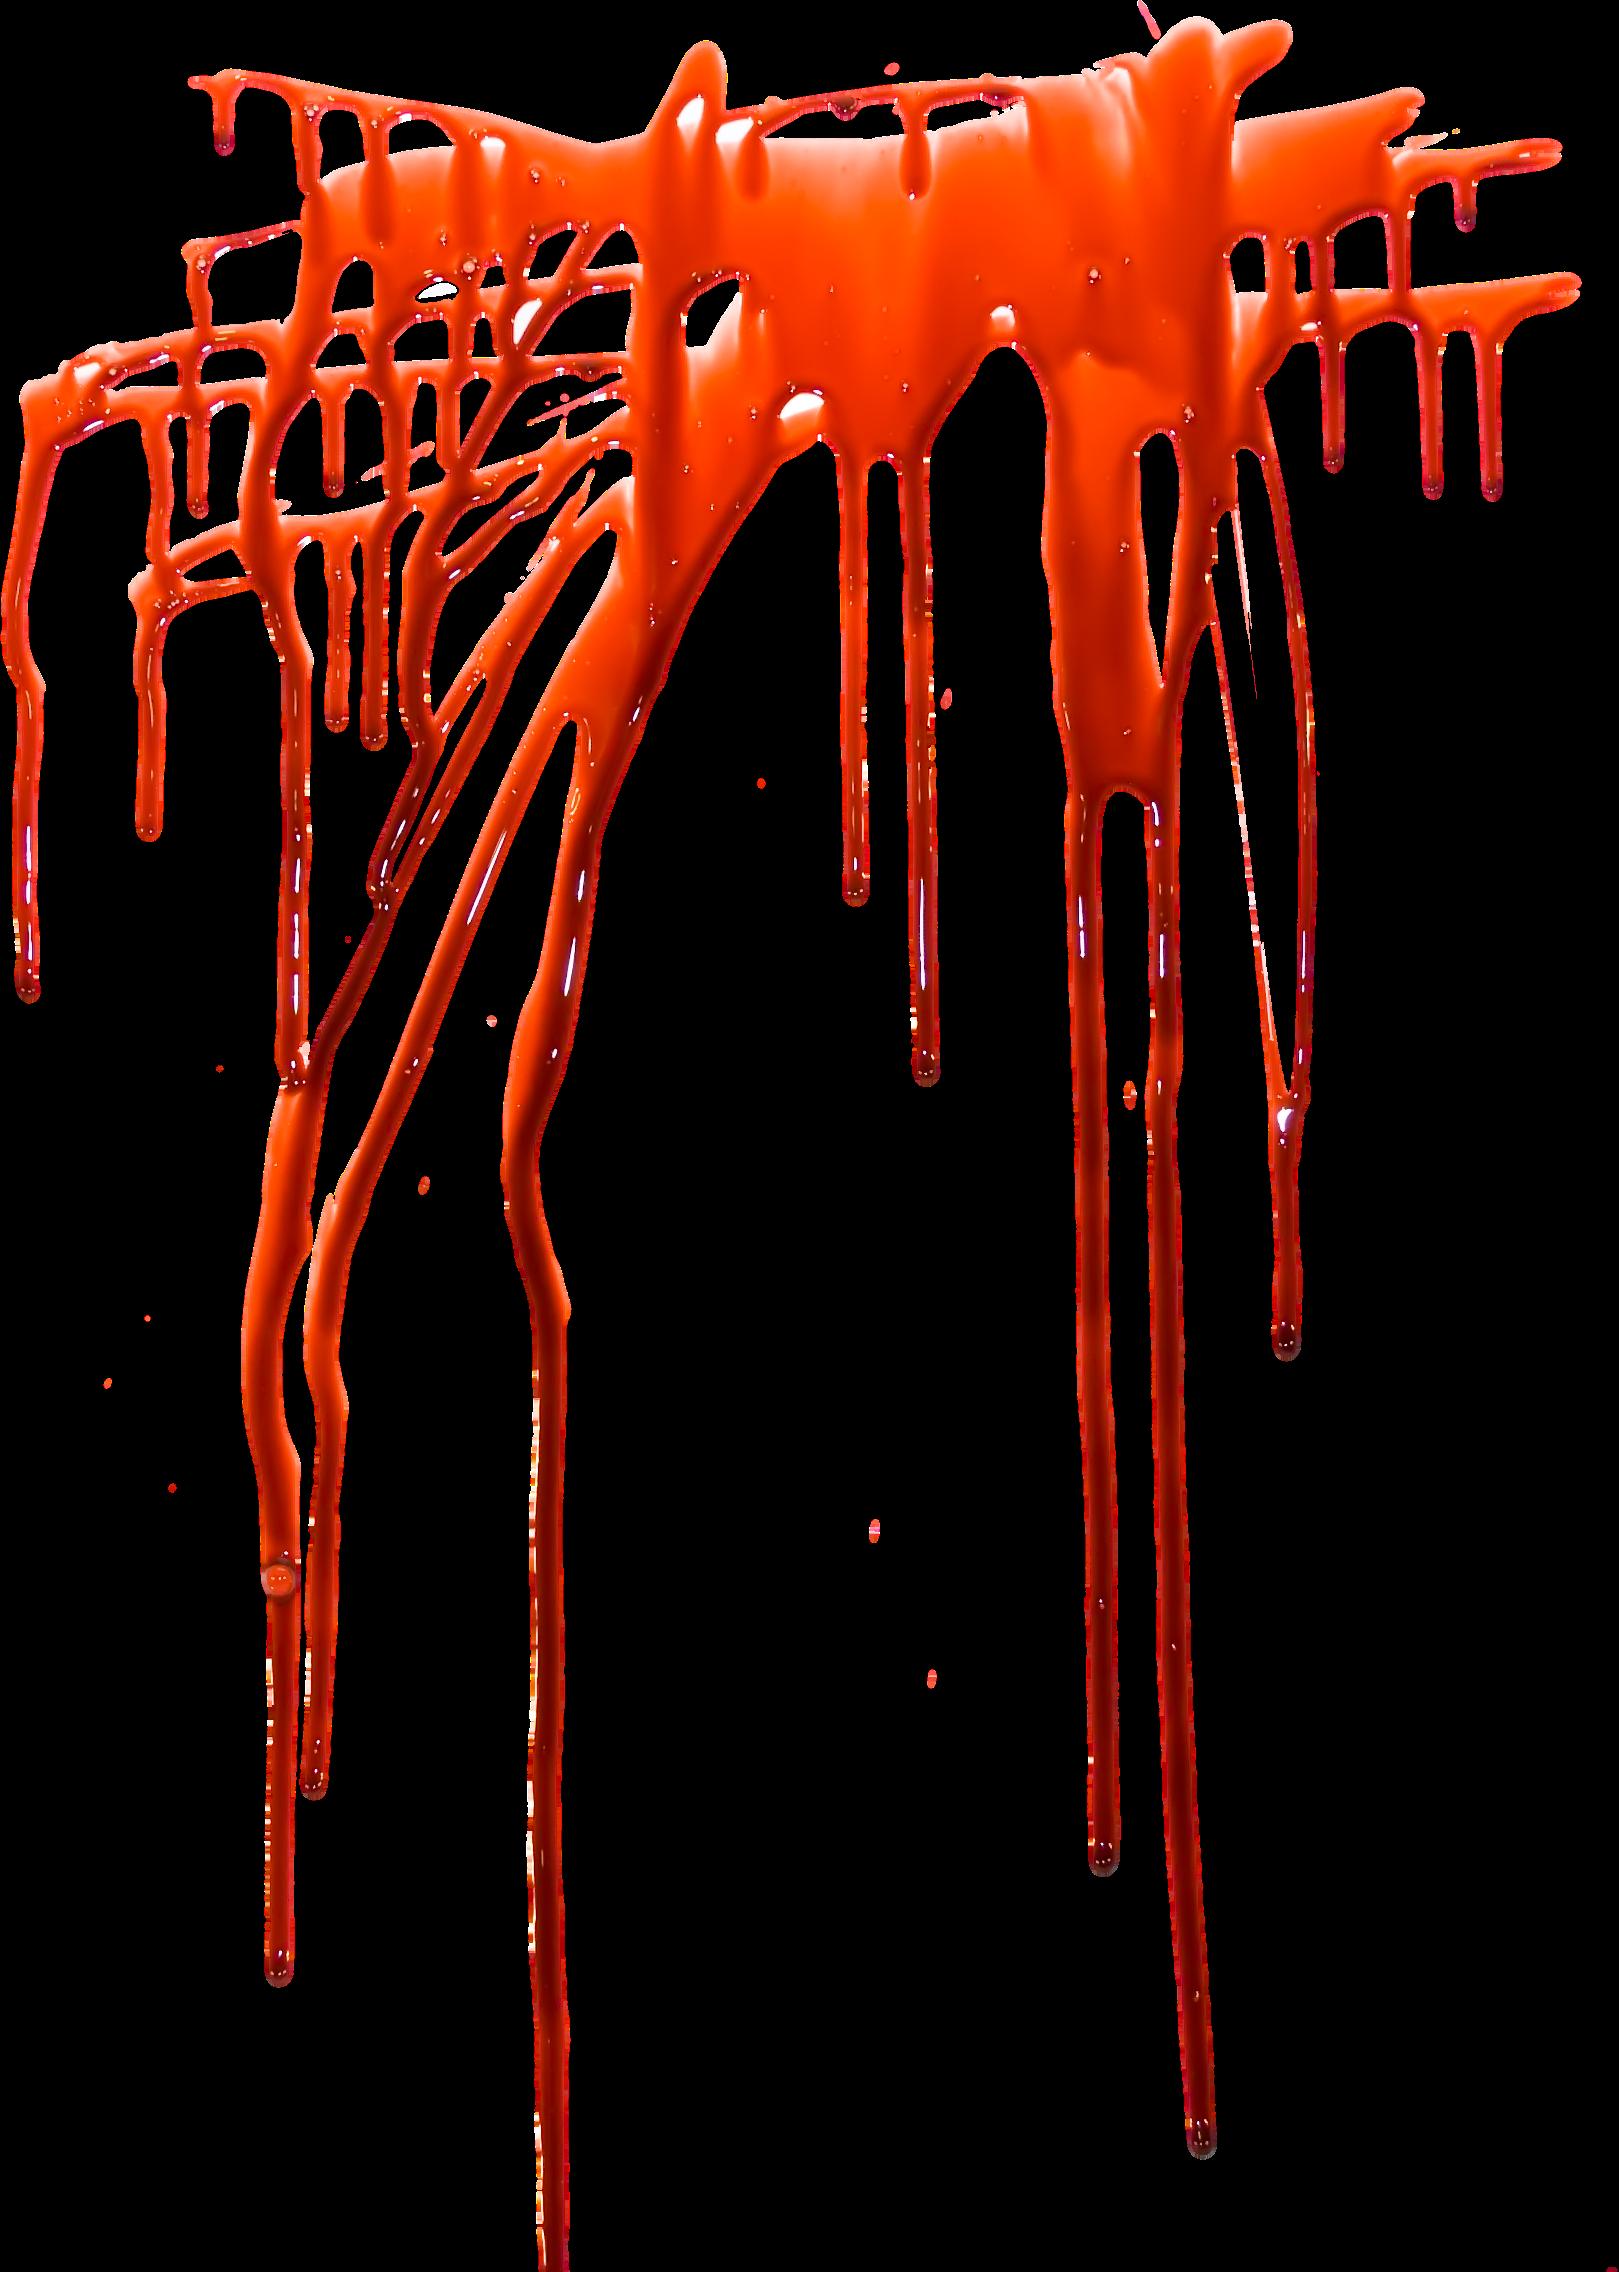 Blood splashes PNG image